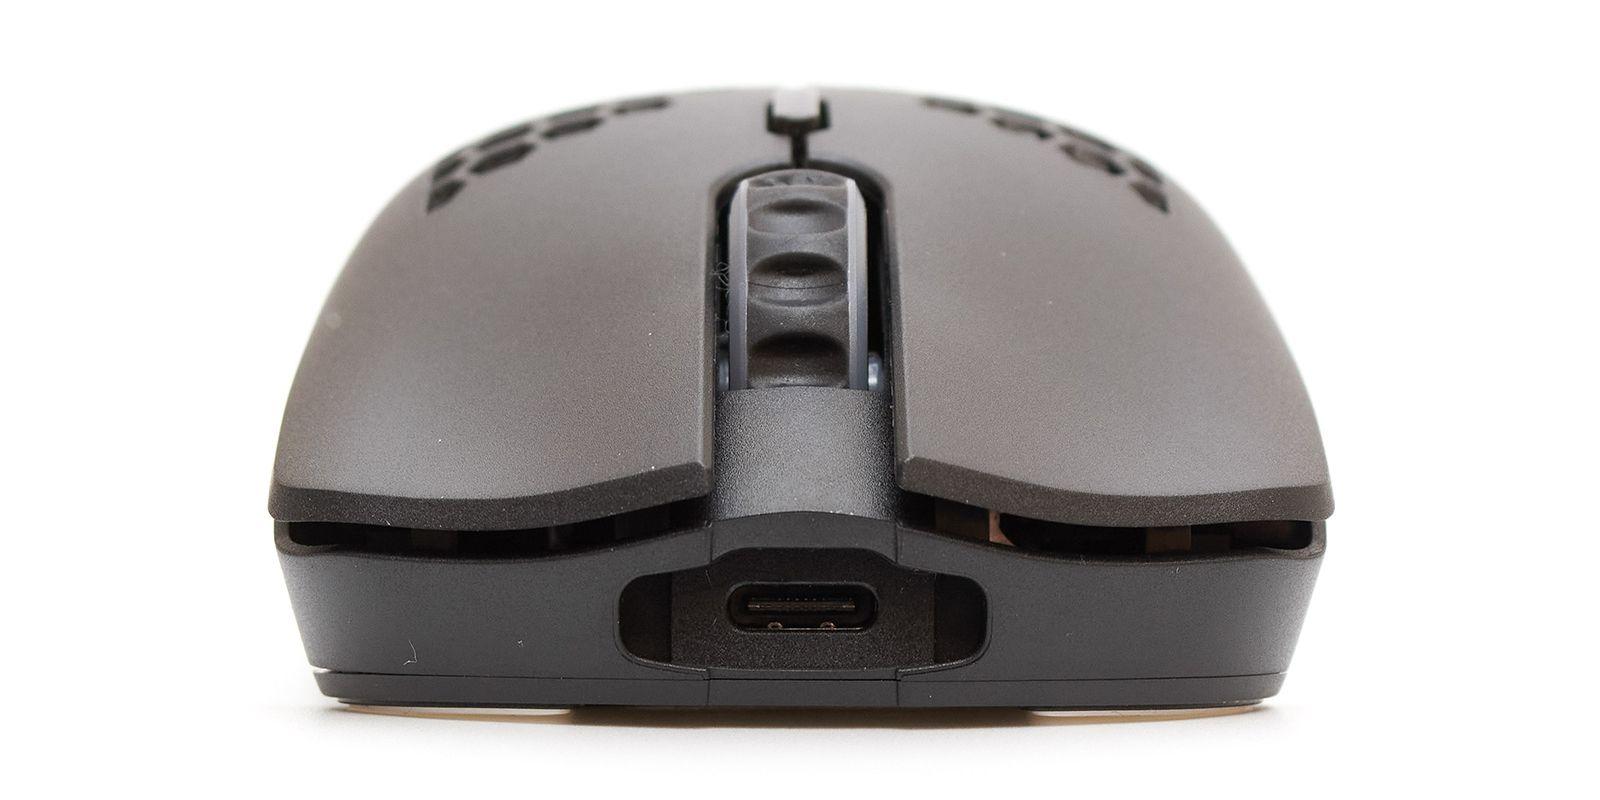 Мышь Glorious Model O Wireless. Фото 7